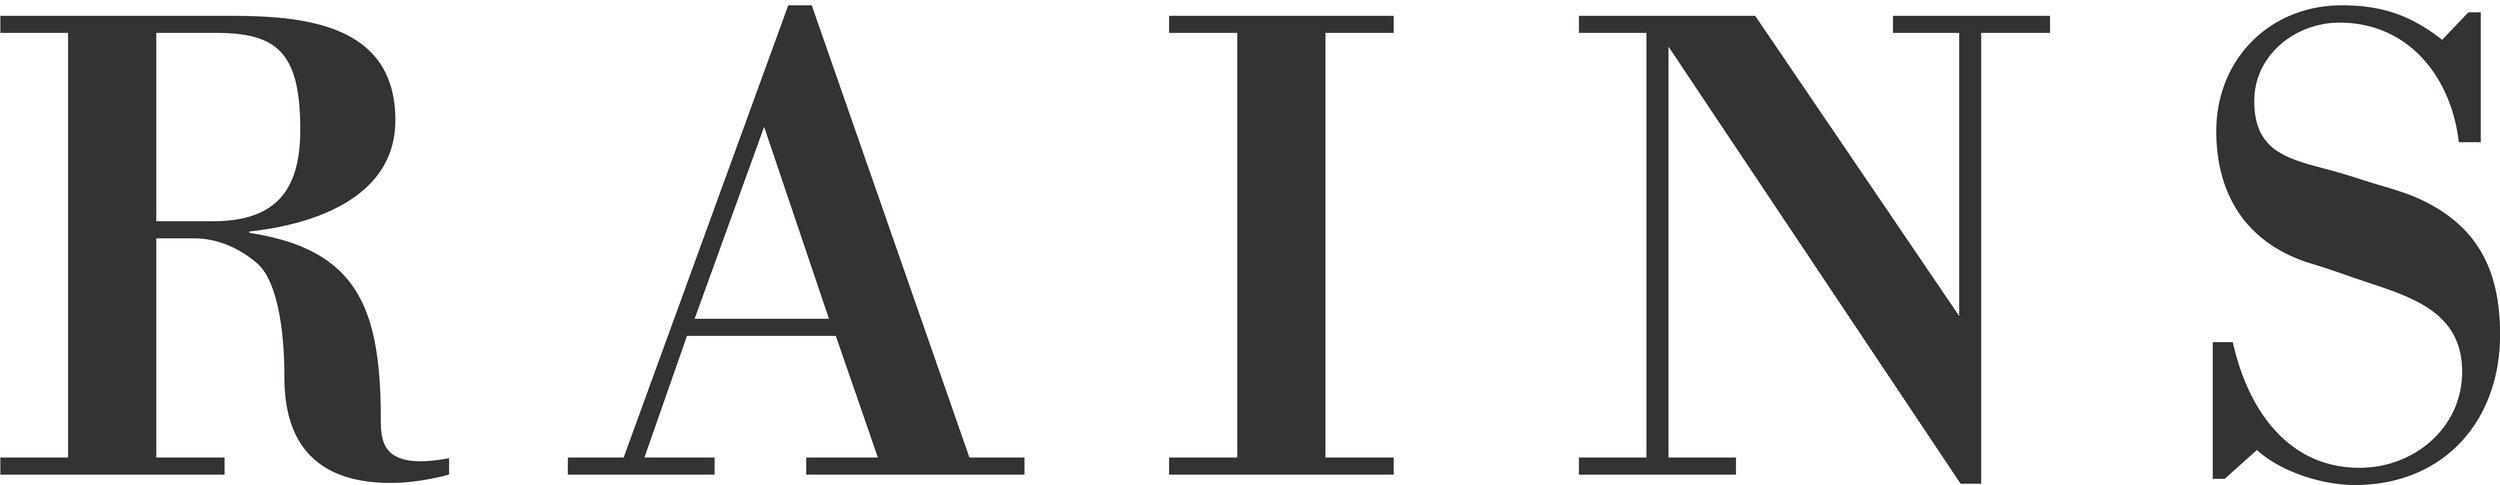 Logo_stripped.jpg